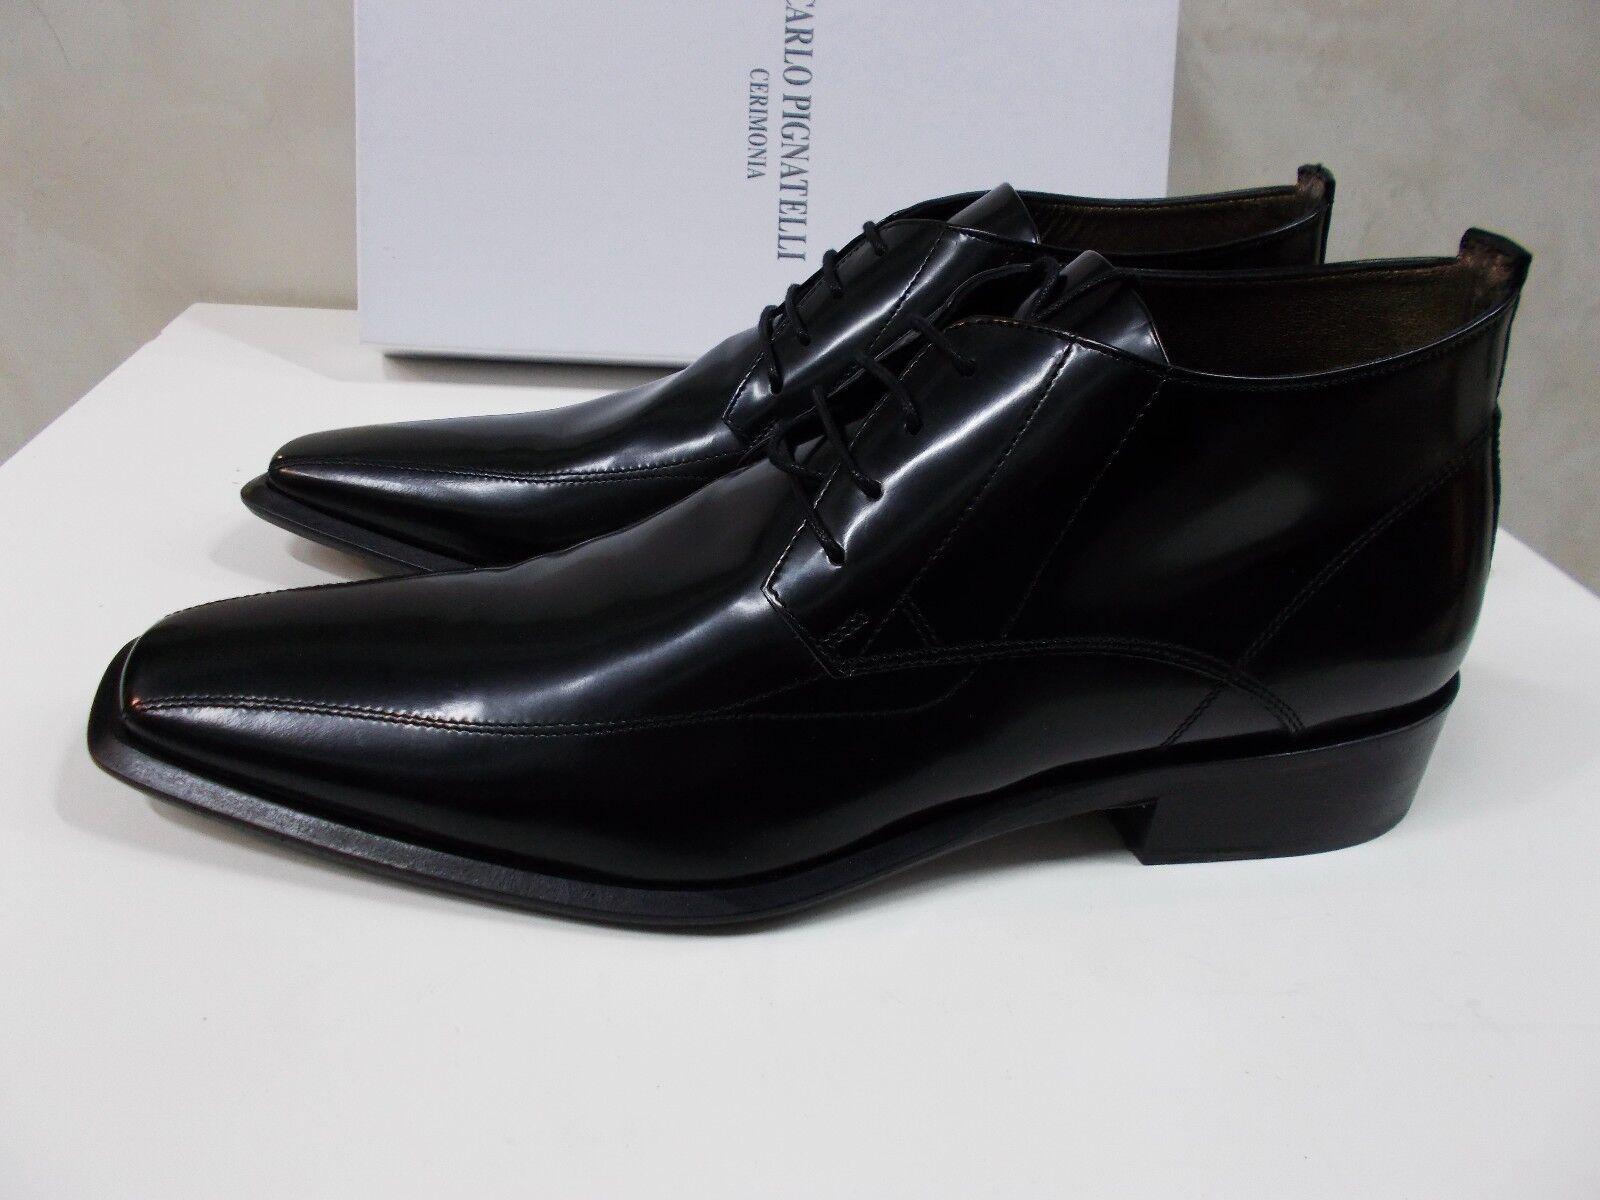 Herrenschuhe n. 44 CARLO CARLO CARLO PIGNATELLI Schuhe MAN Männer Schuhe МУЖСКАЯ ОБУВЬ 92dc17